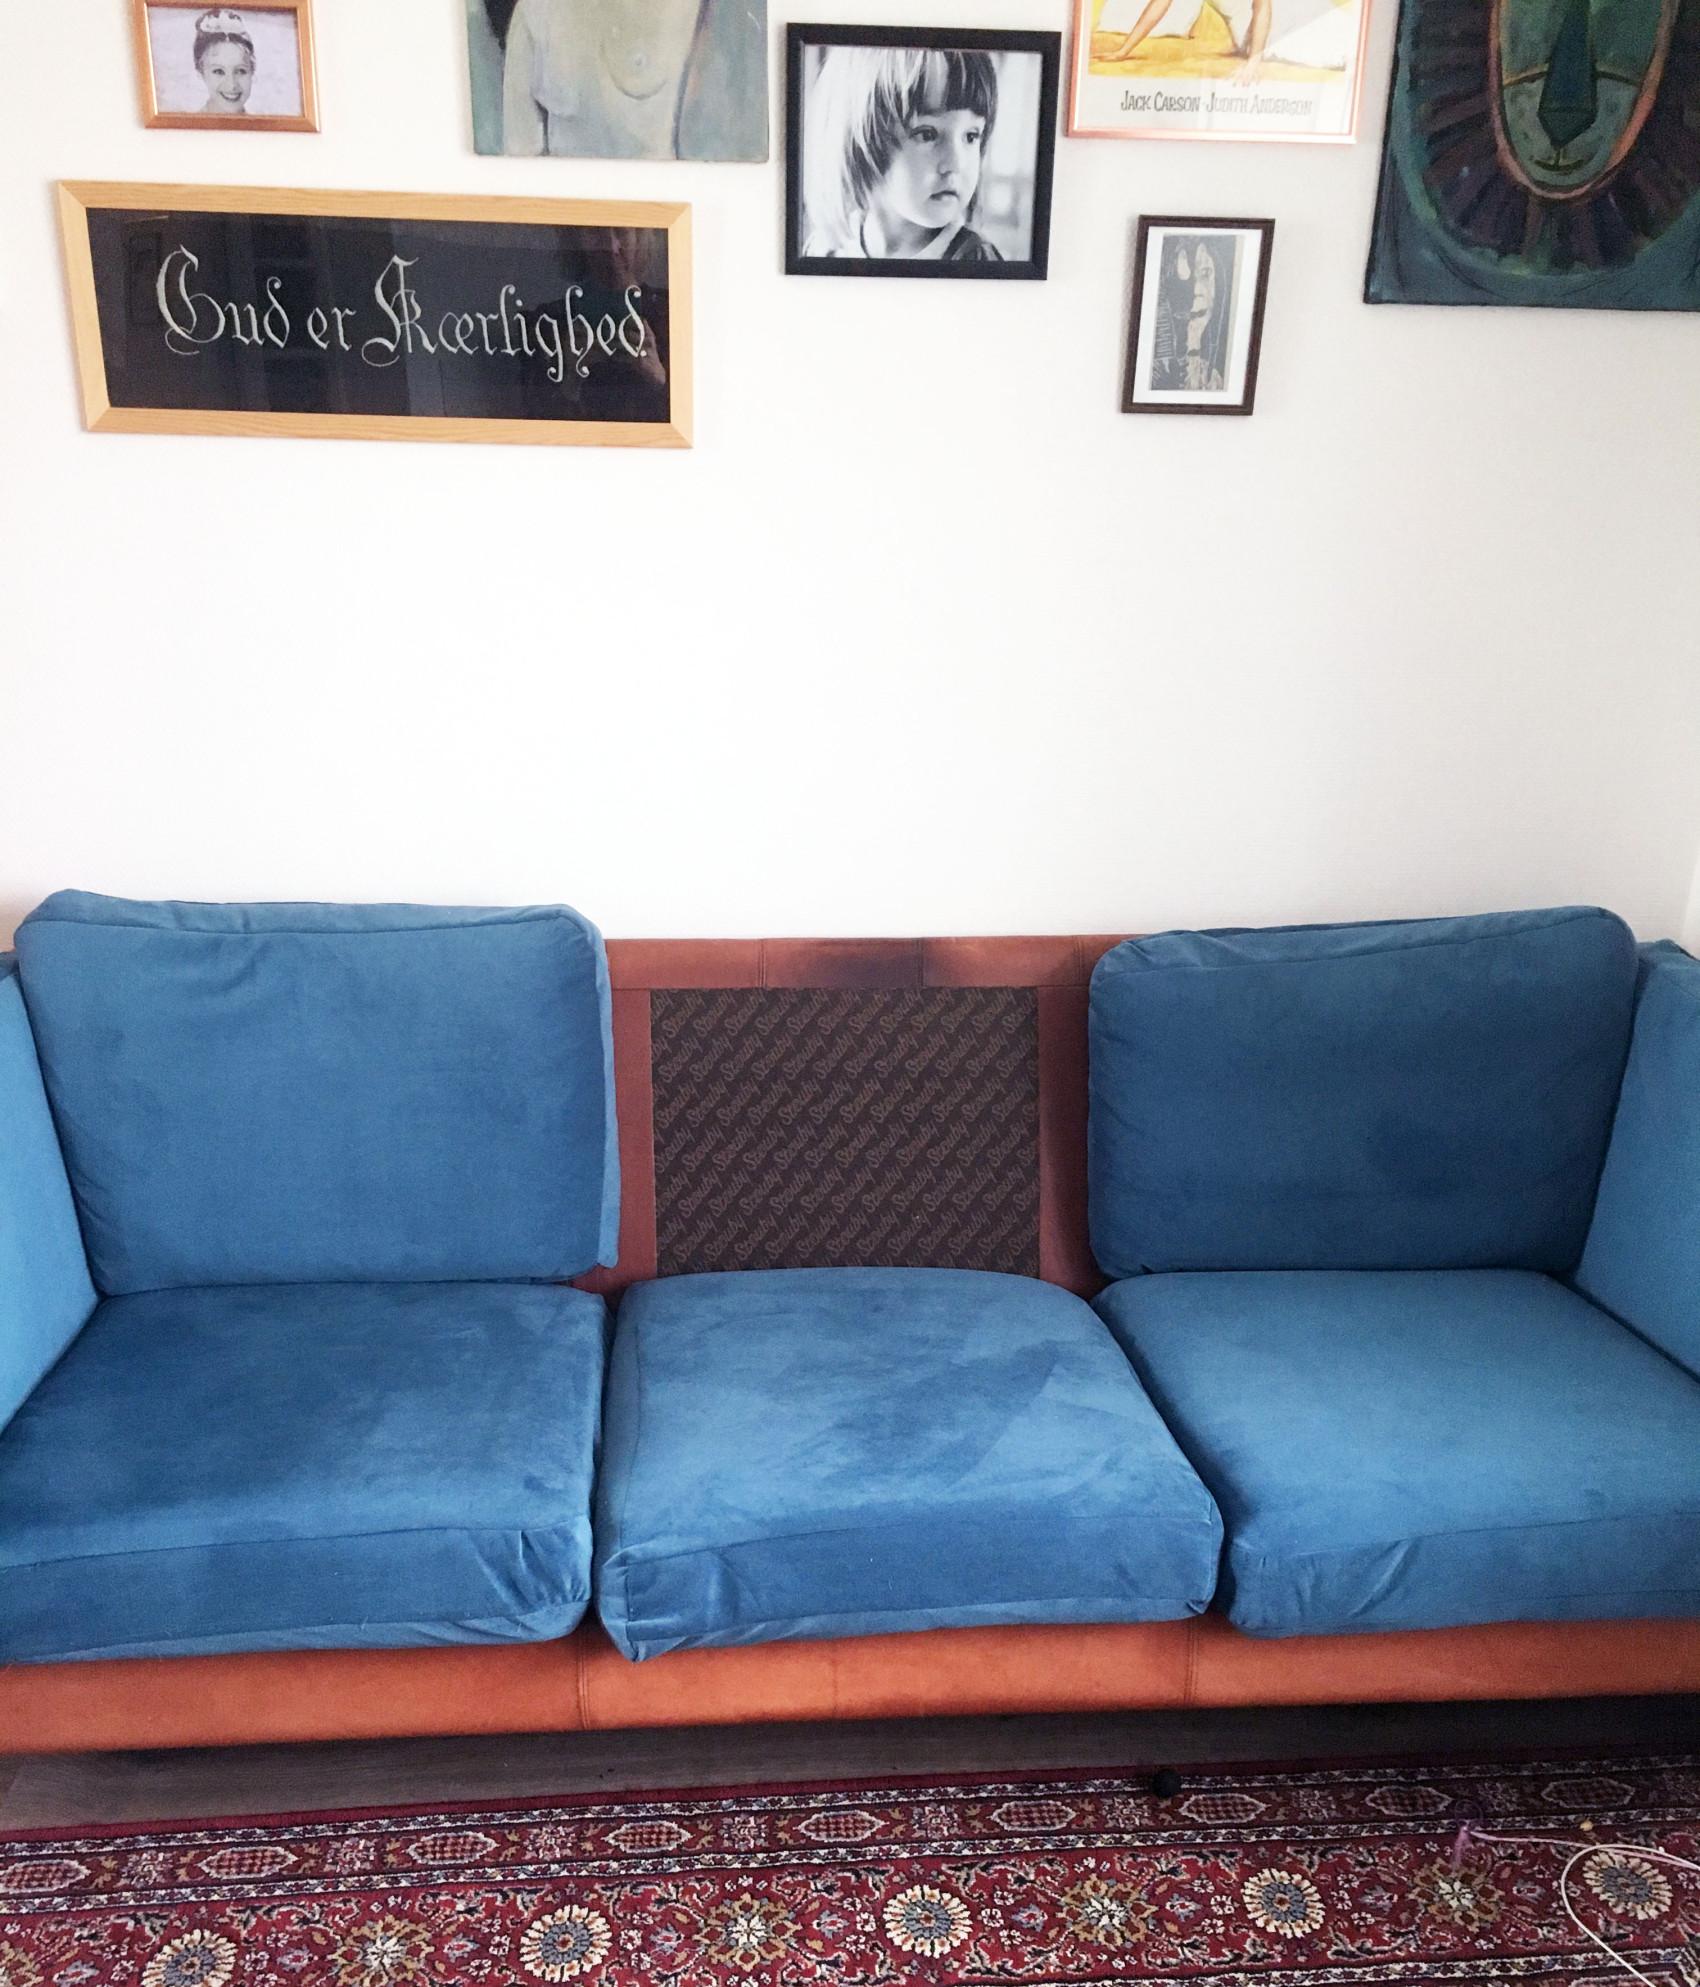 De smukkeste velour sofaer 3